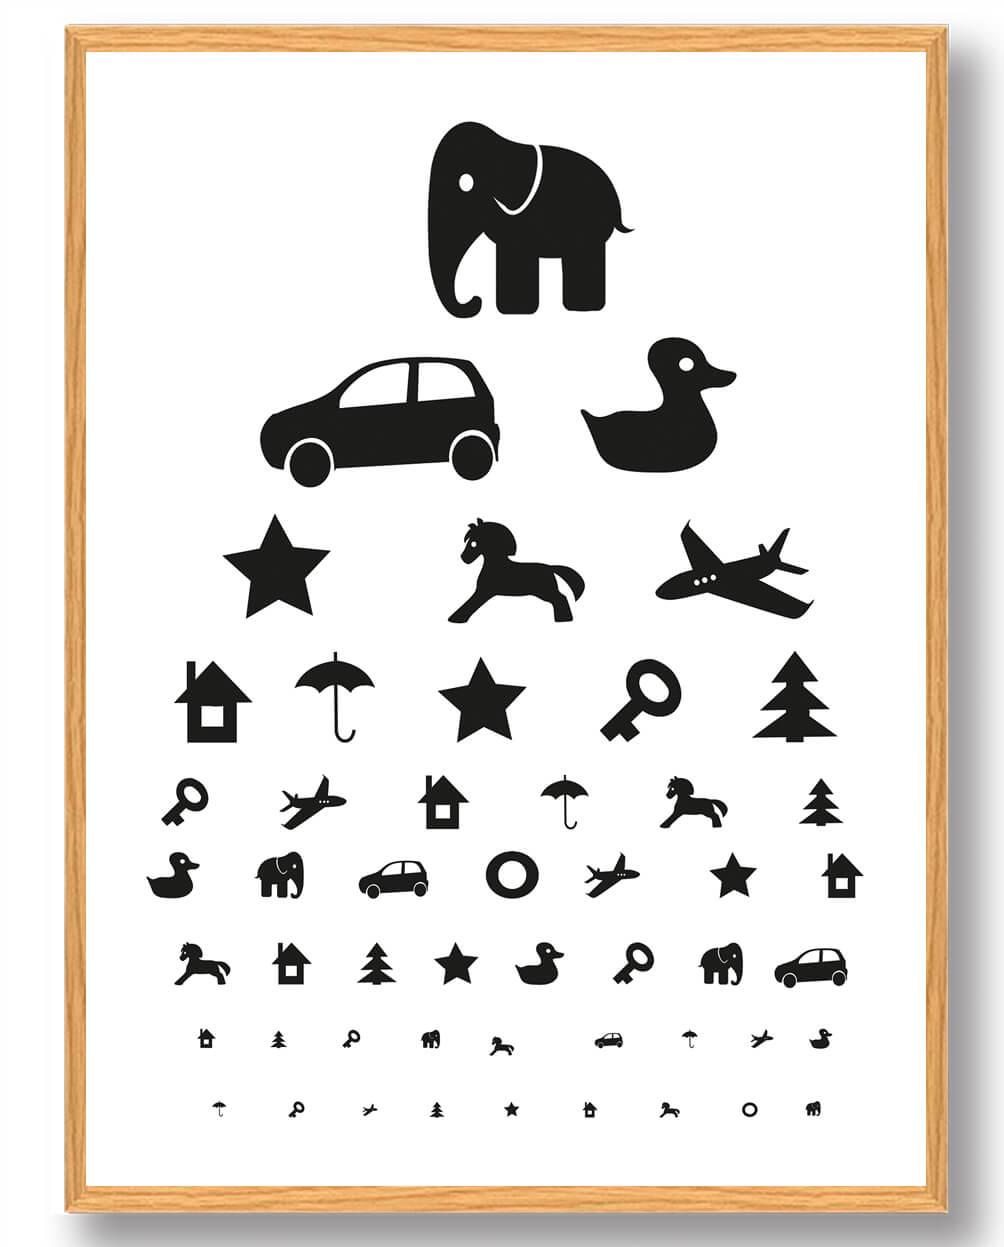 Synstavle sort/hvid - plakat